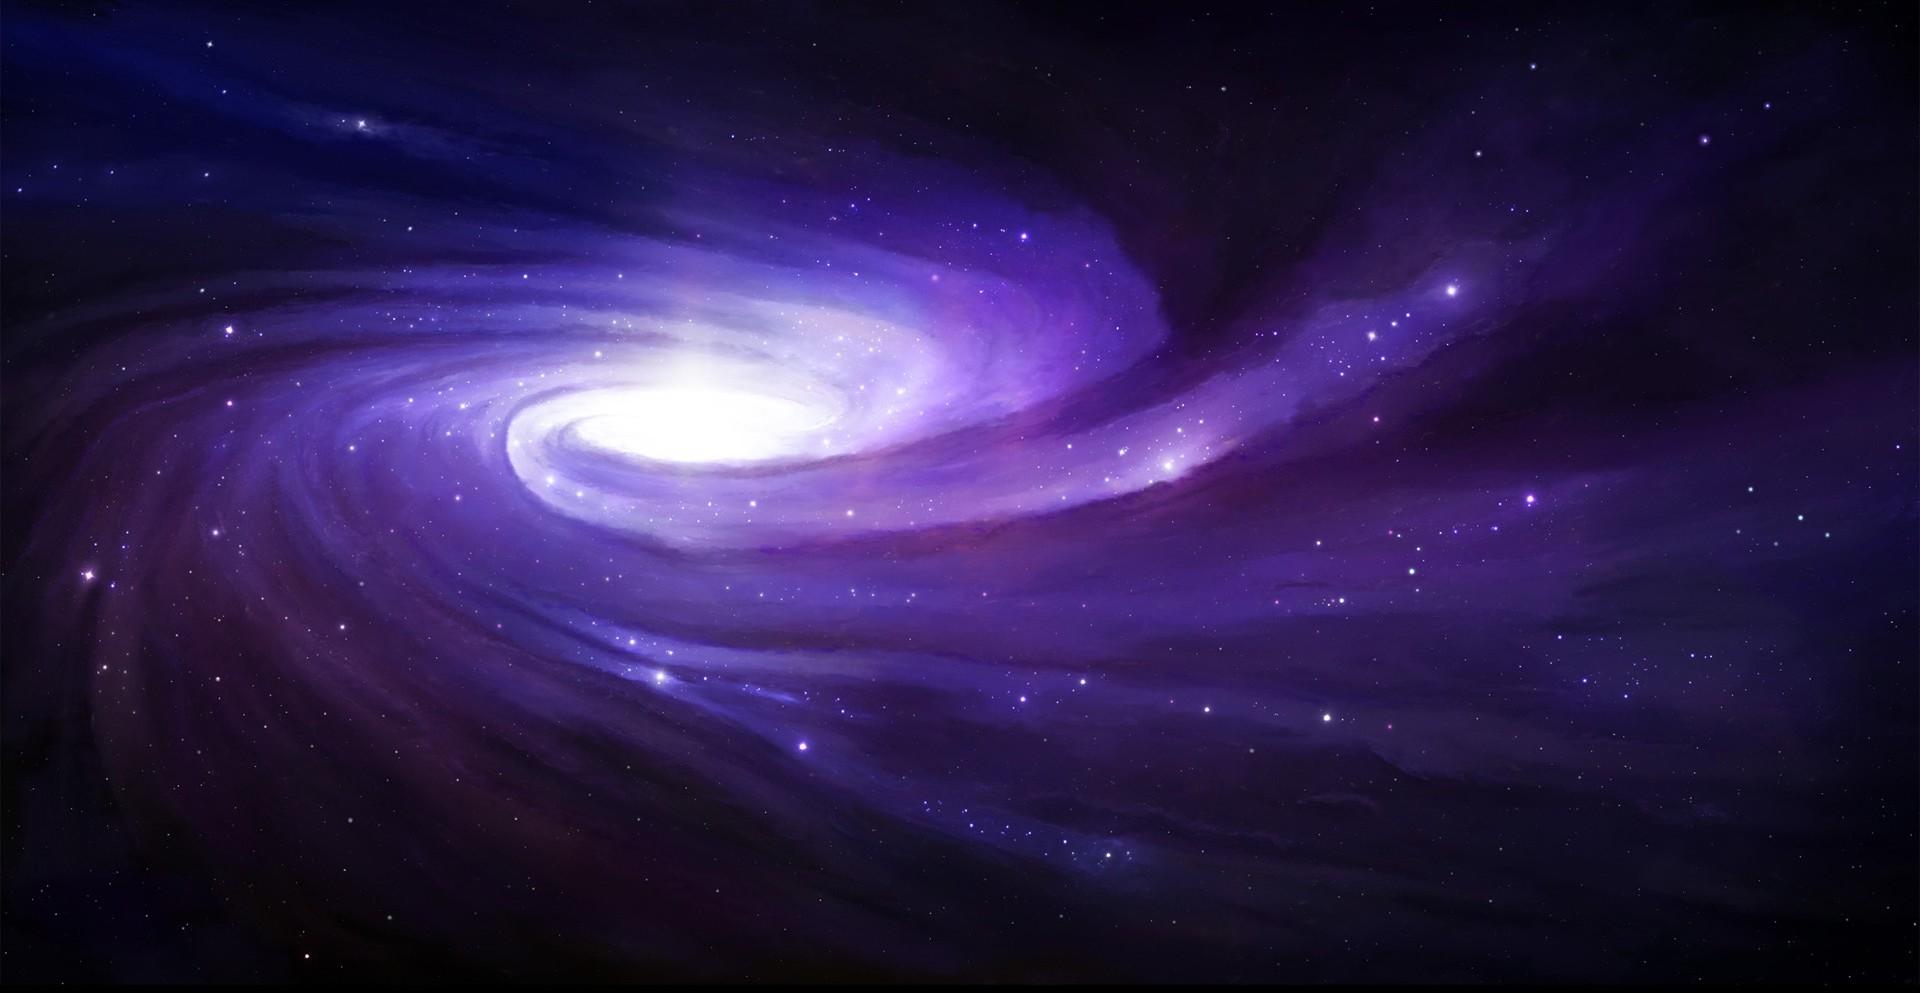 Galaxy Wallpaper 20